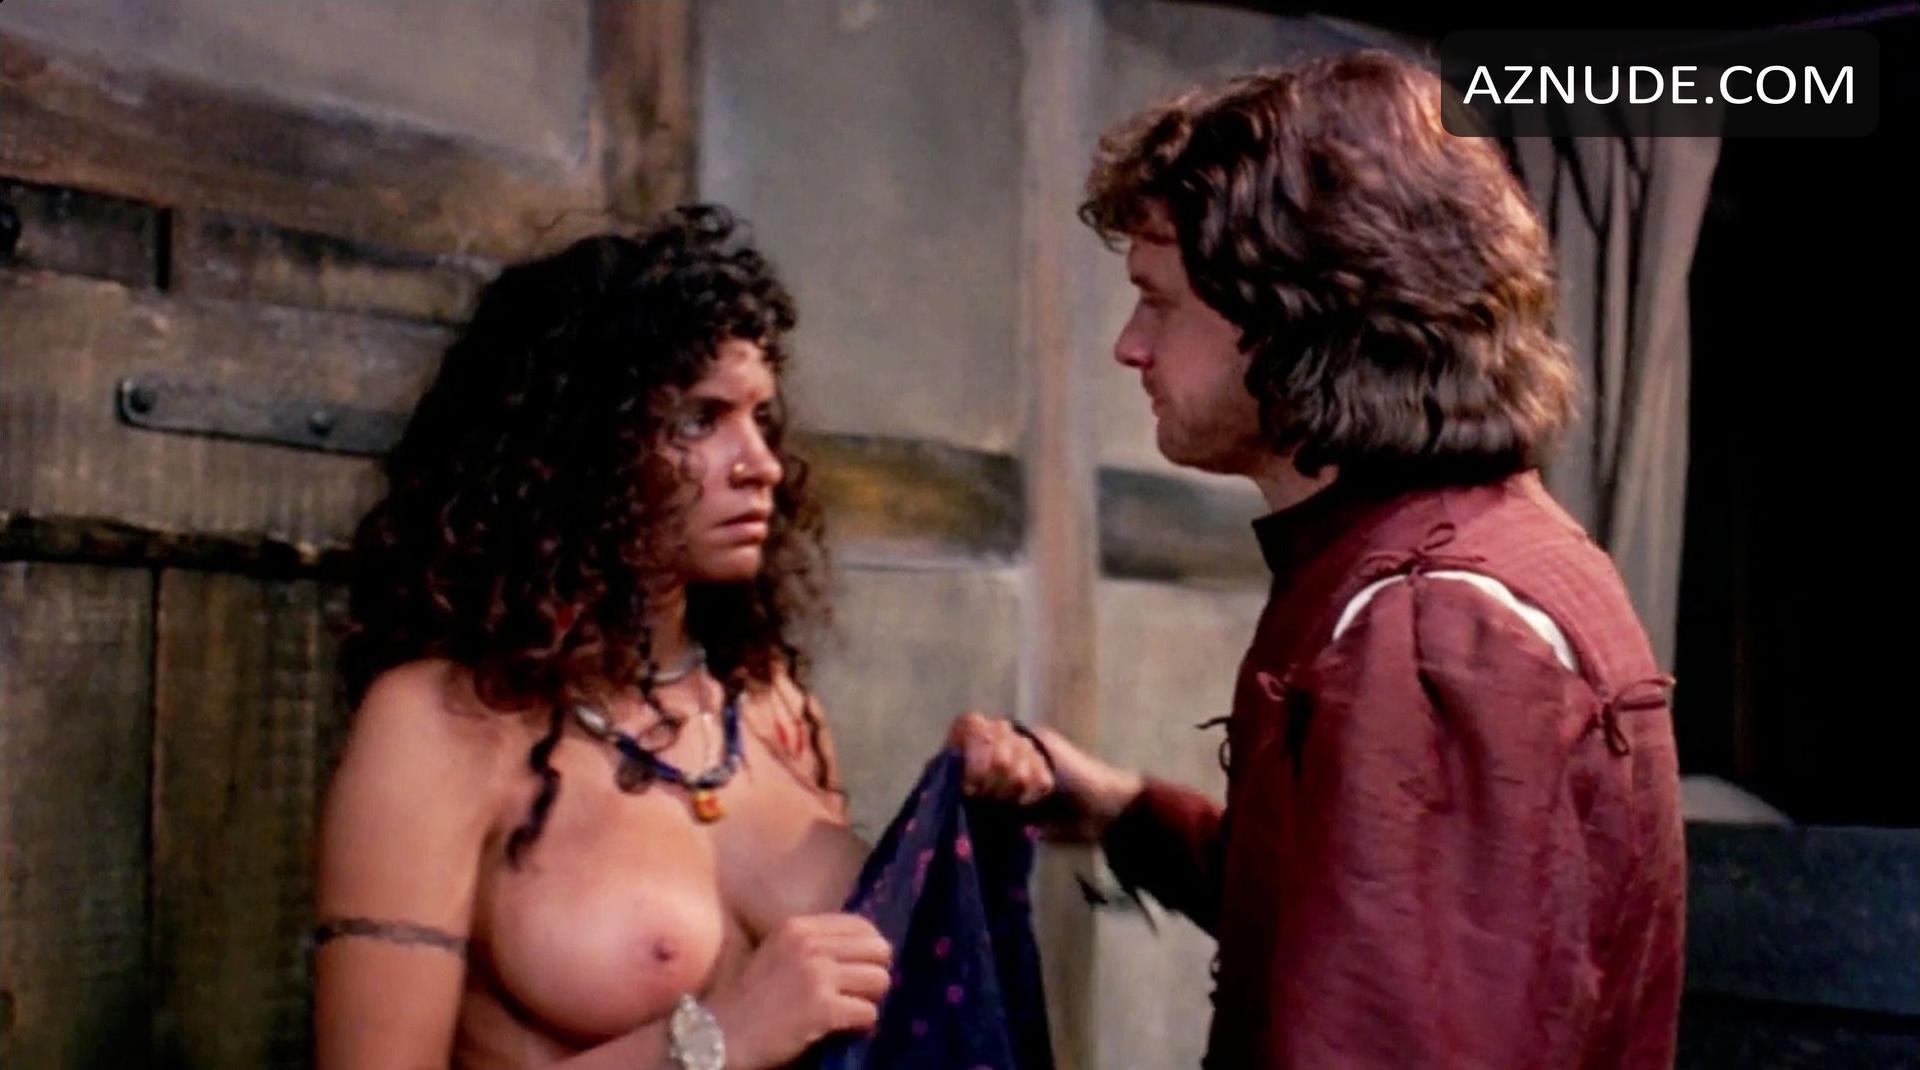 Amandine Klep Nue browse celebrity nude images - page 273 - aznude